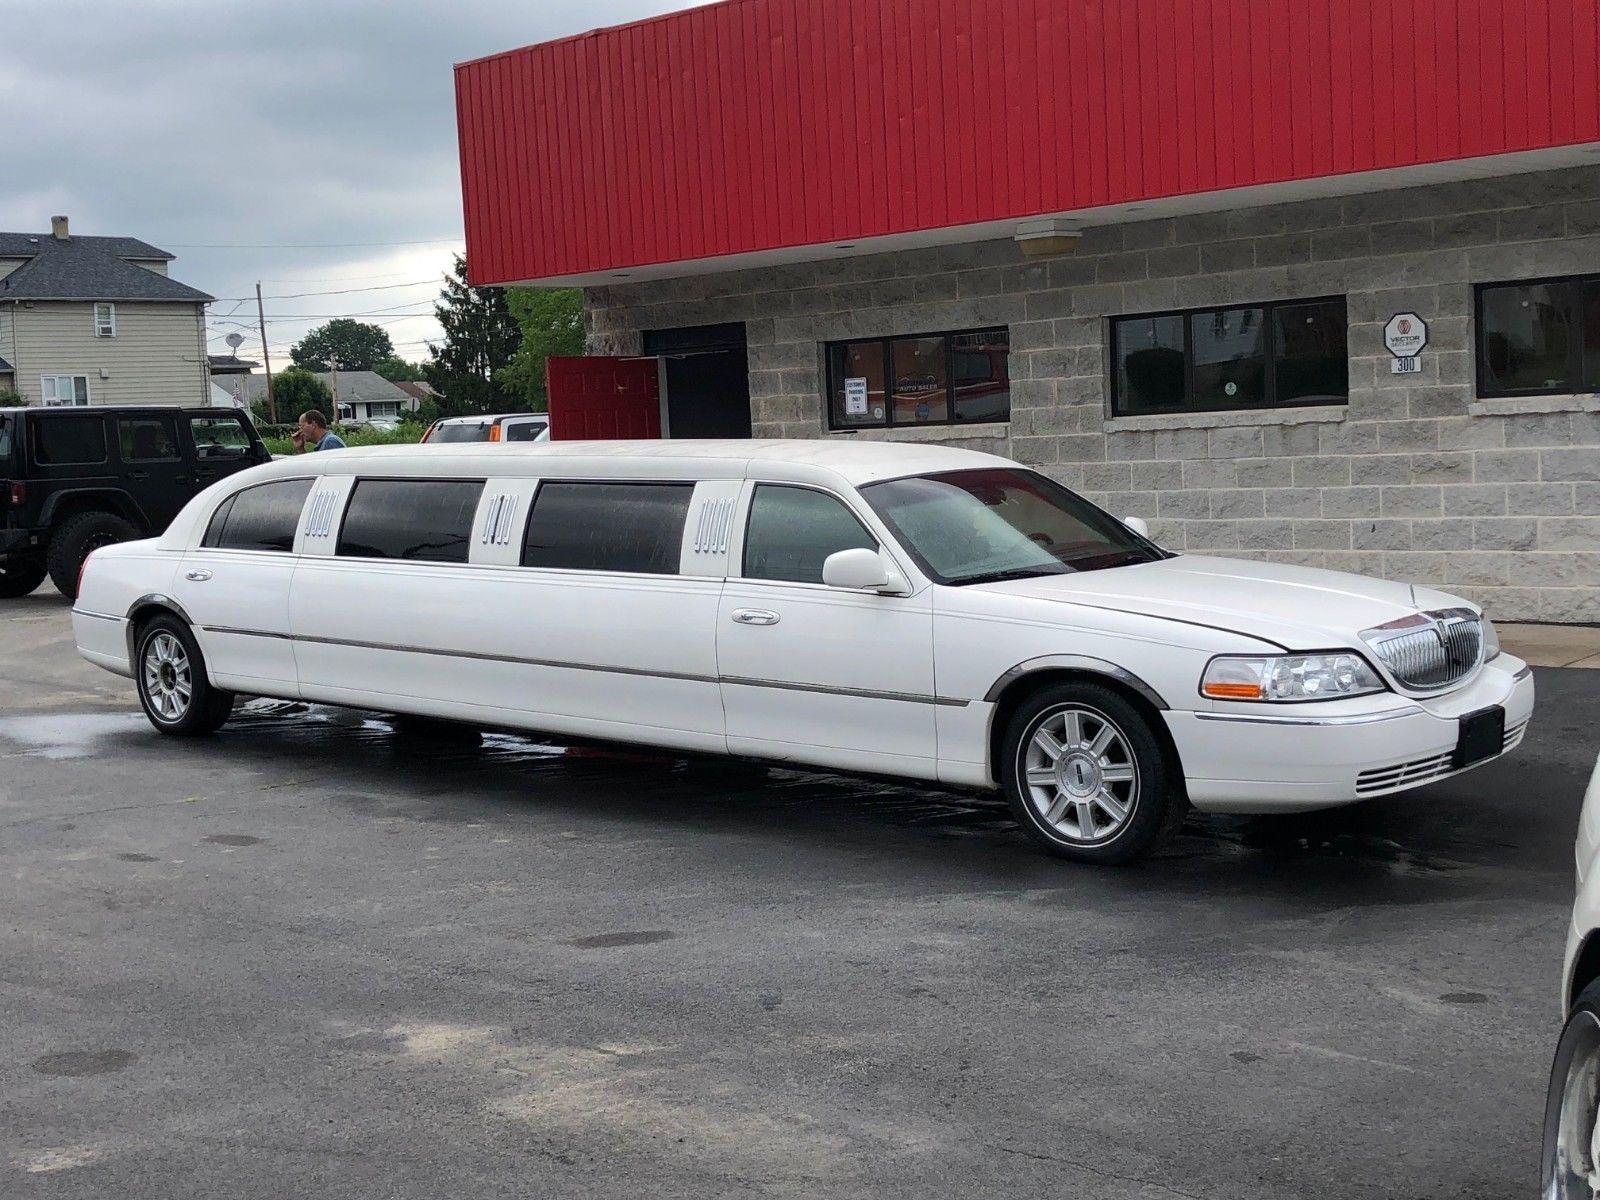 Needs Tlc 2006 Lincoln Town Car Limousine Limousines For Sale